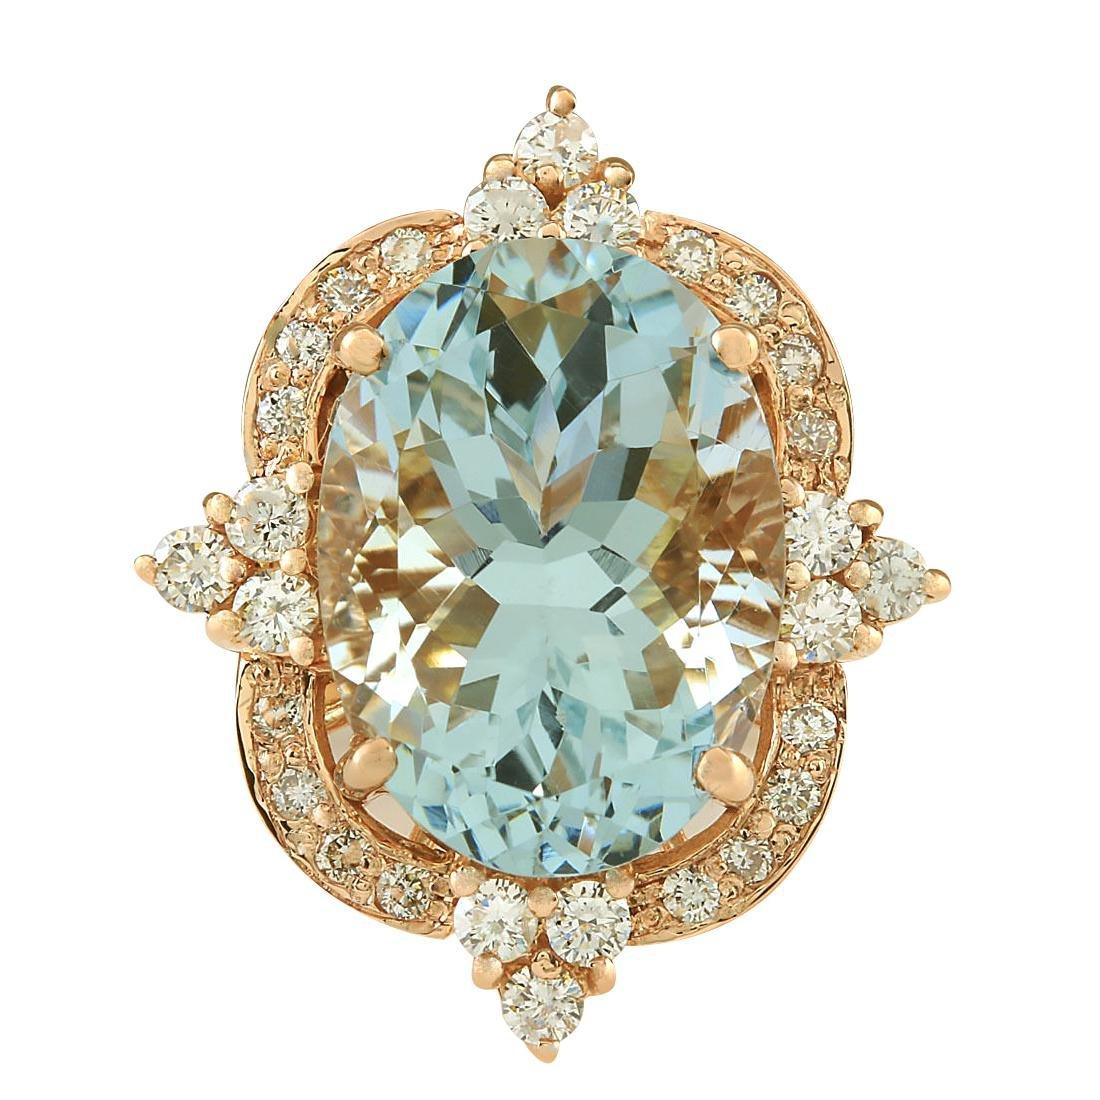 8.27CTW Natural Aquamarine And Diamond Ring In 18K Rose